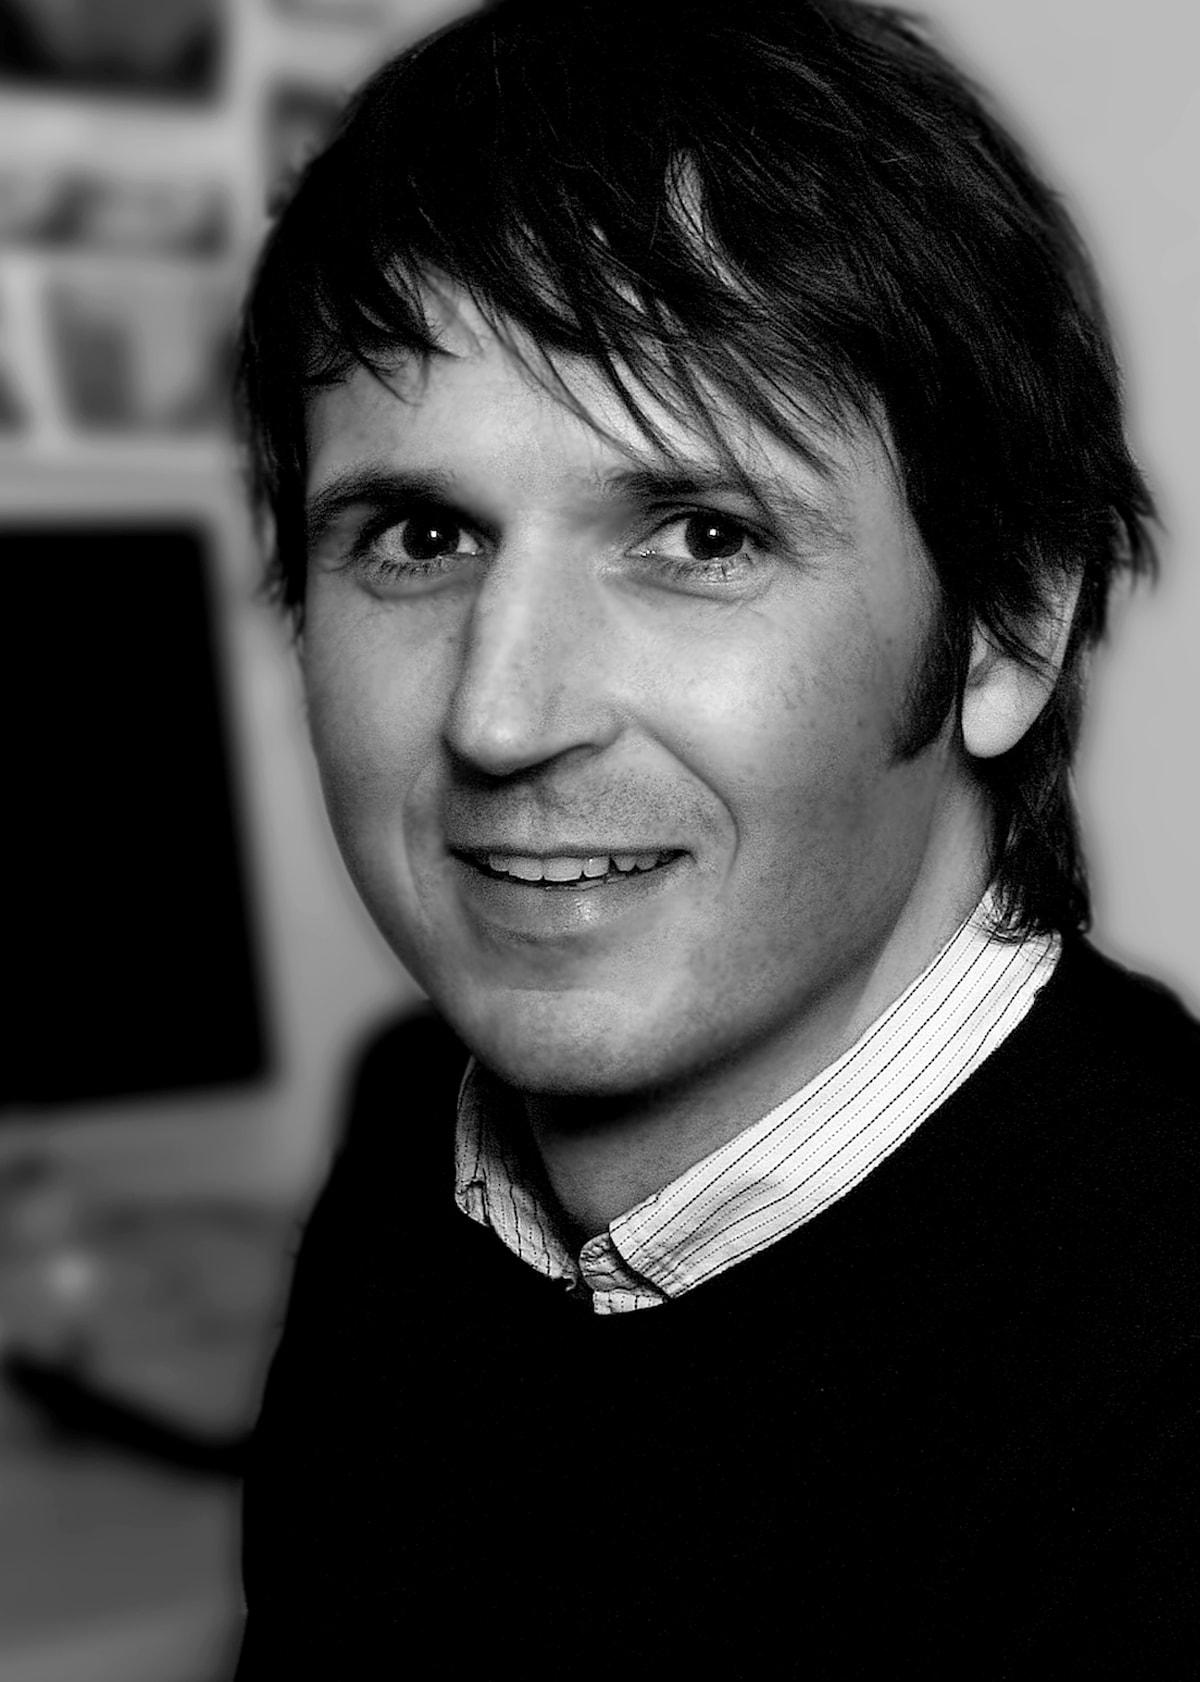 Matthias From Erfurt, Germany